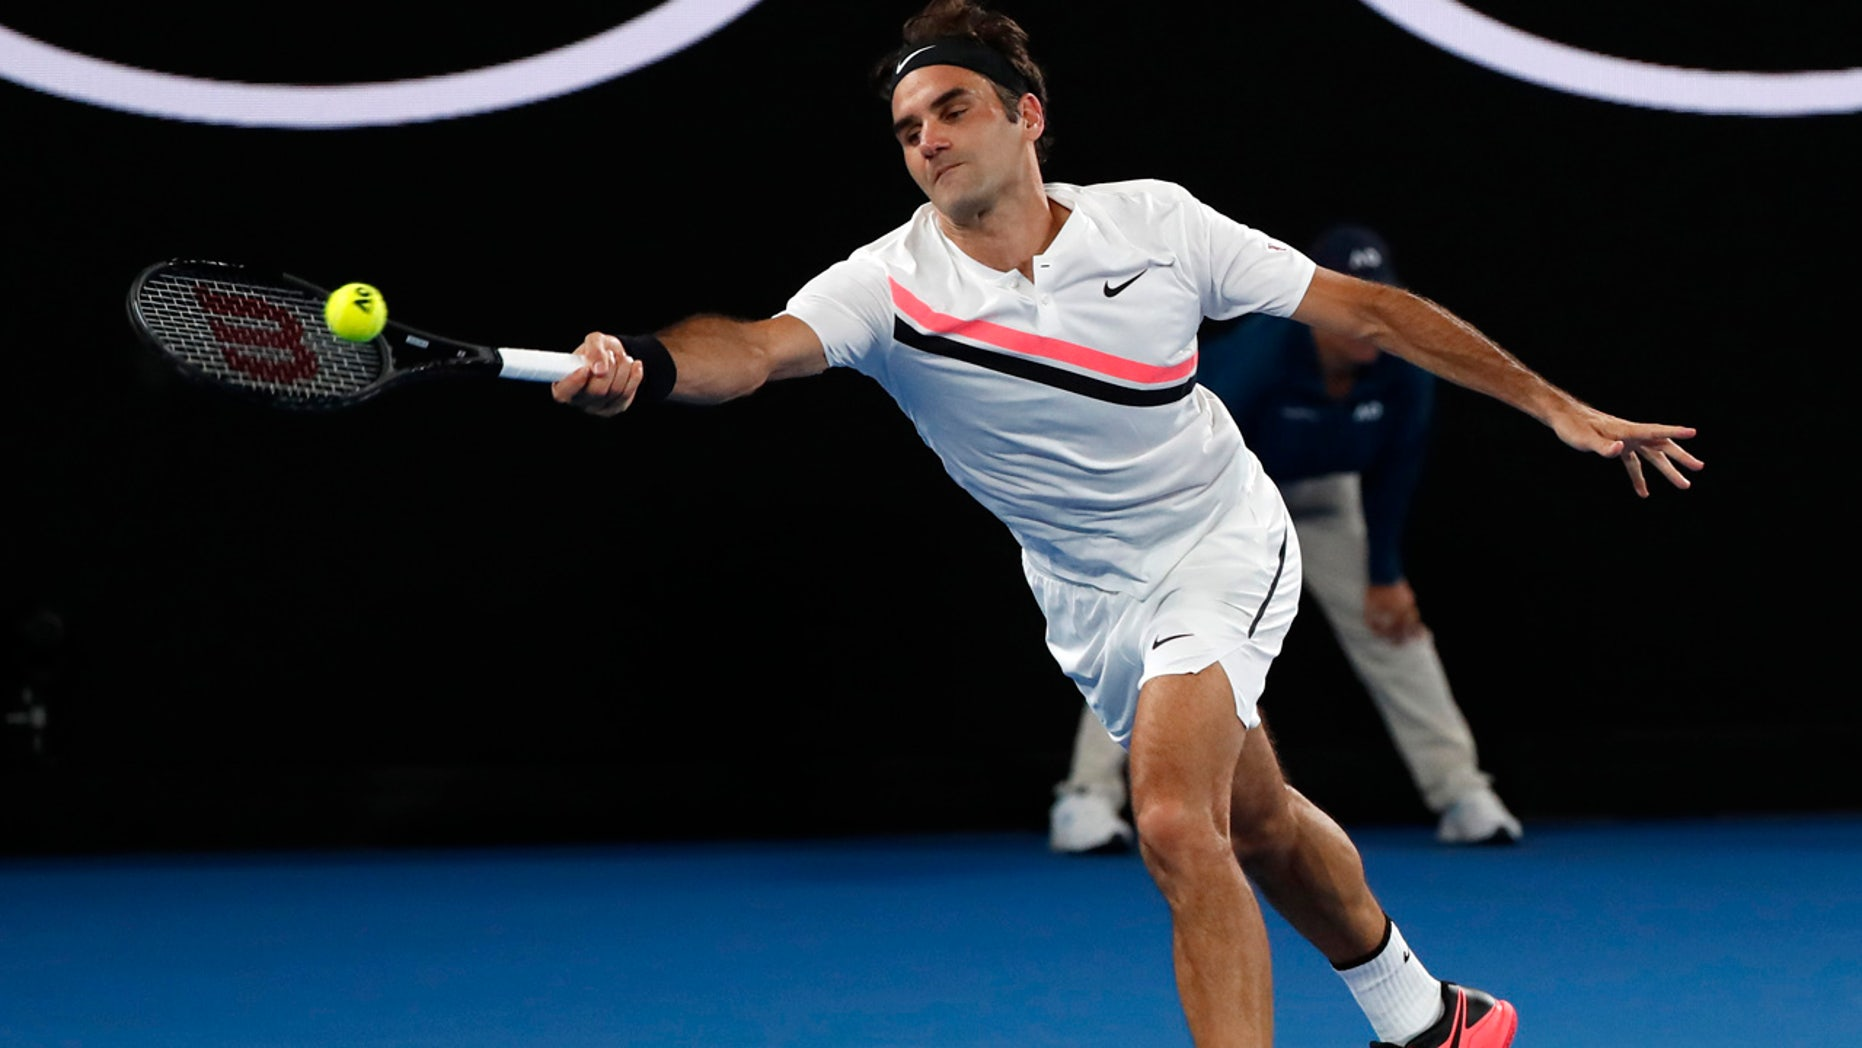 Switzerland's Roger Federer beat Marin Cilic to win the Australian Open title.